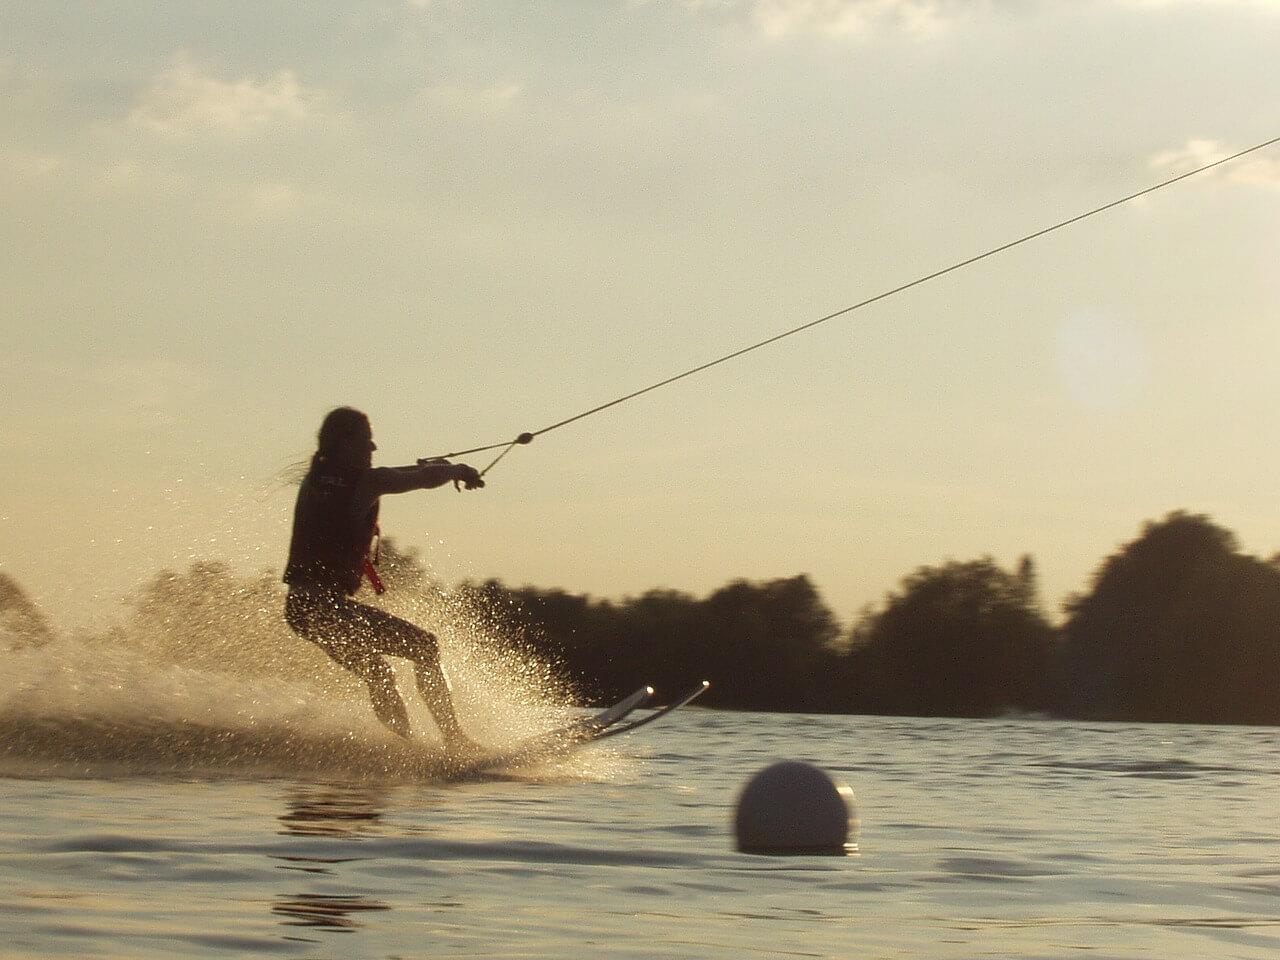 water skiier